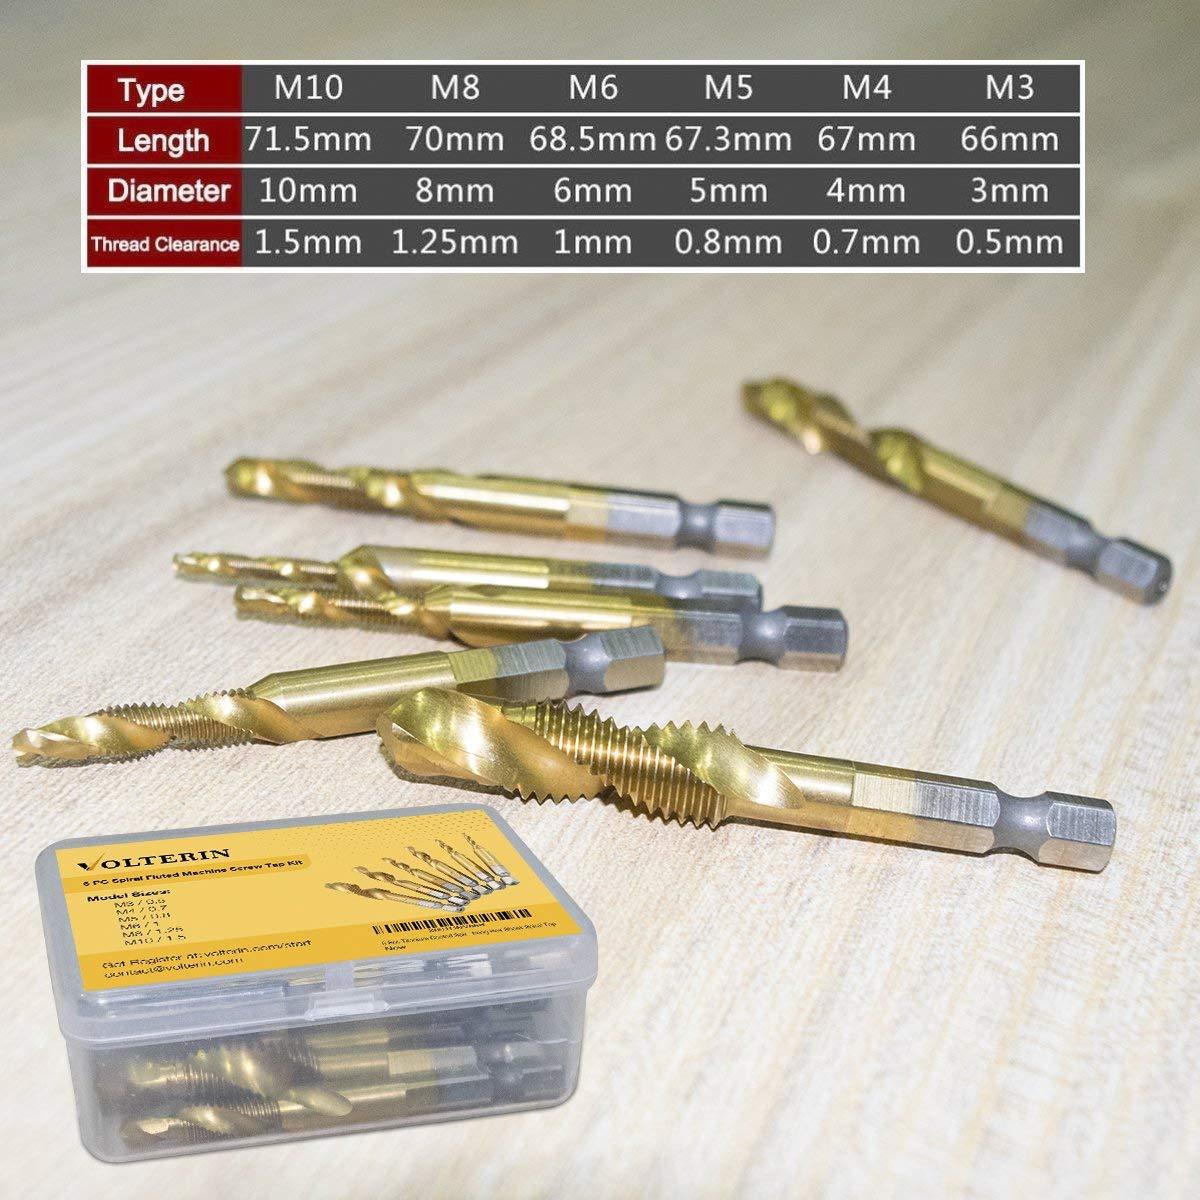 6 Pcs Titanium Coated HSS 6542 Volterin Titanium Step Drill Bit Set Multiple Hole Step Drill bit 3-Piece Set Spiral Tap Drill Bit Set by Volterin